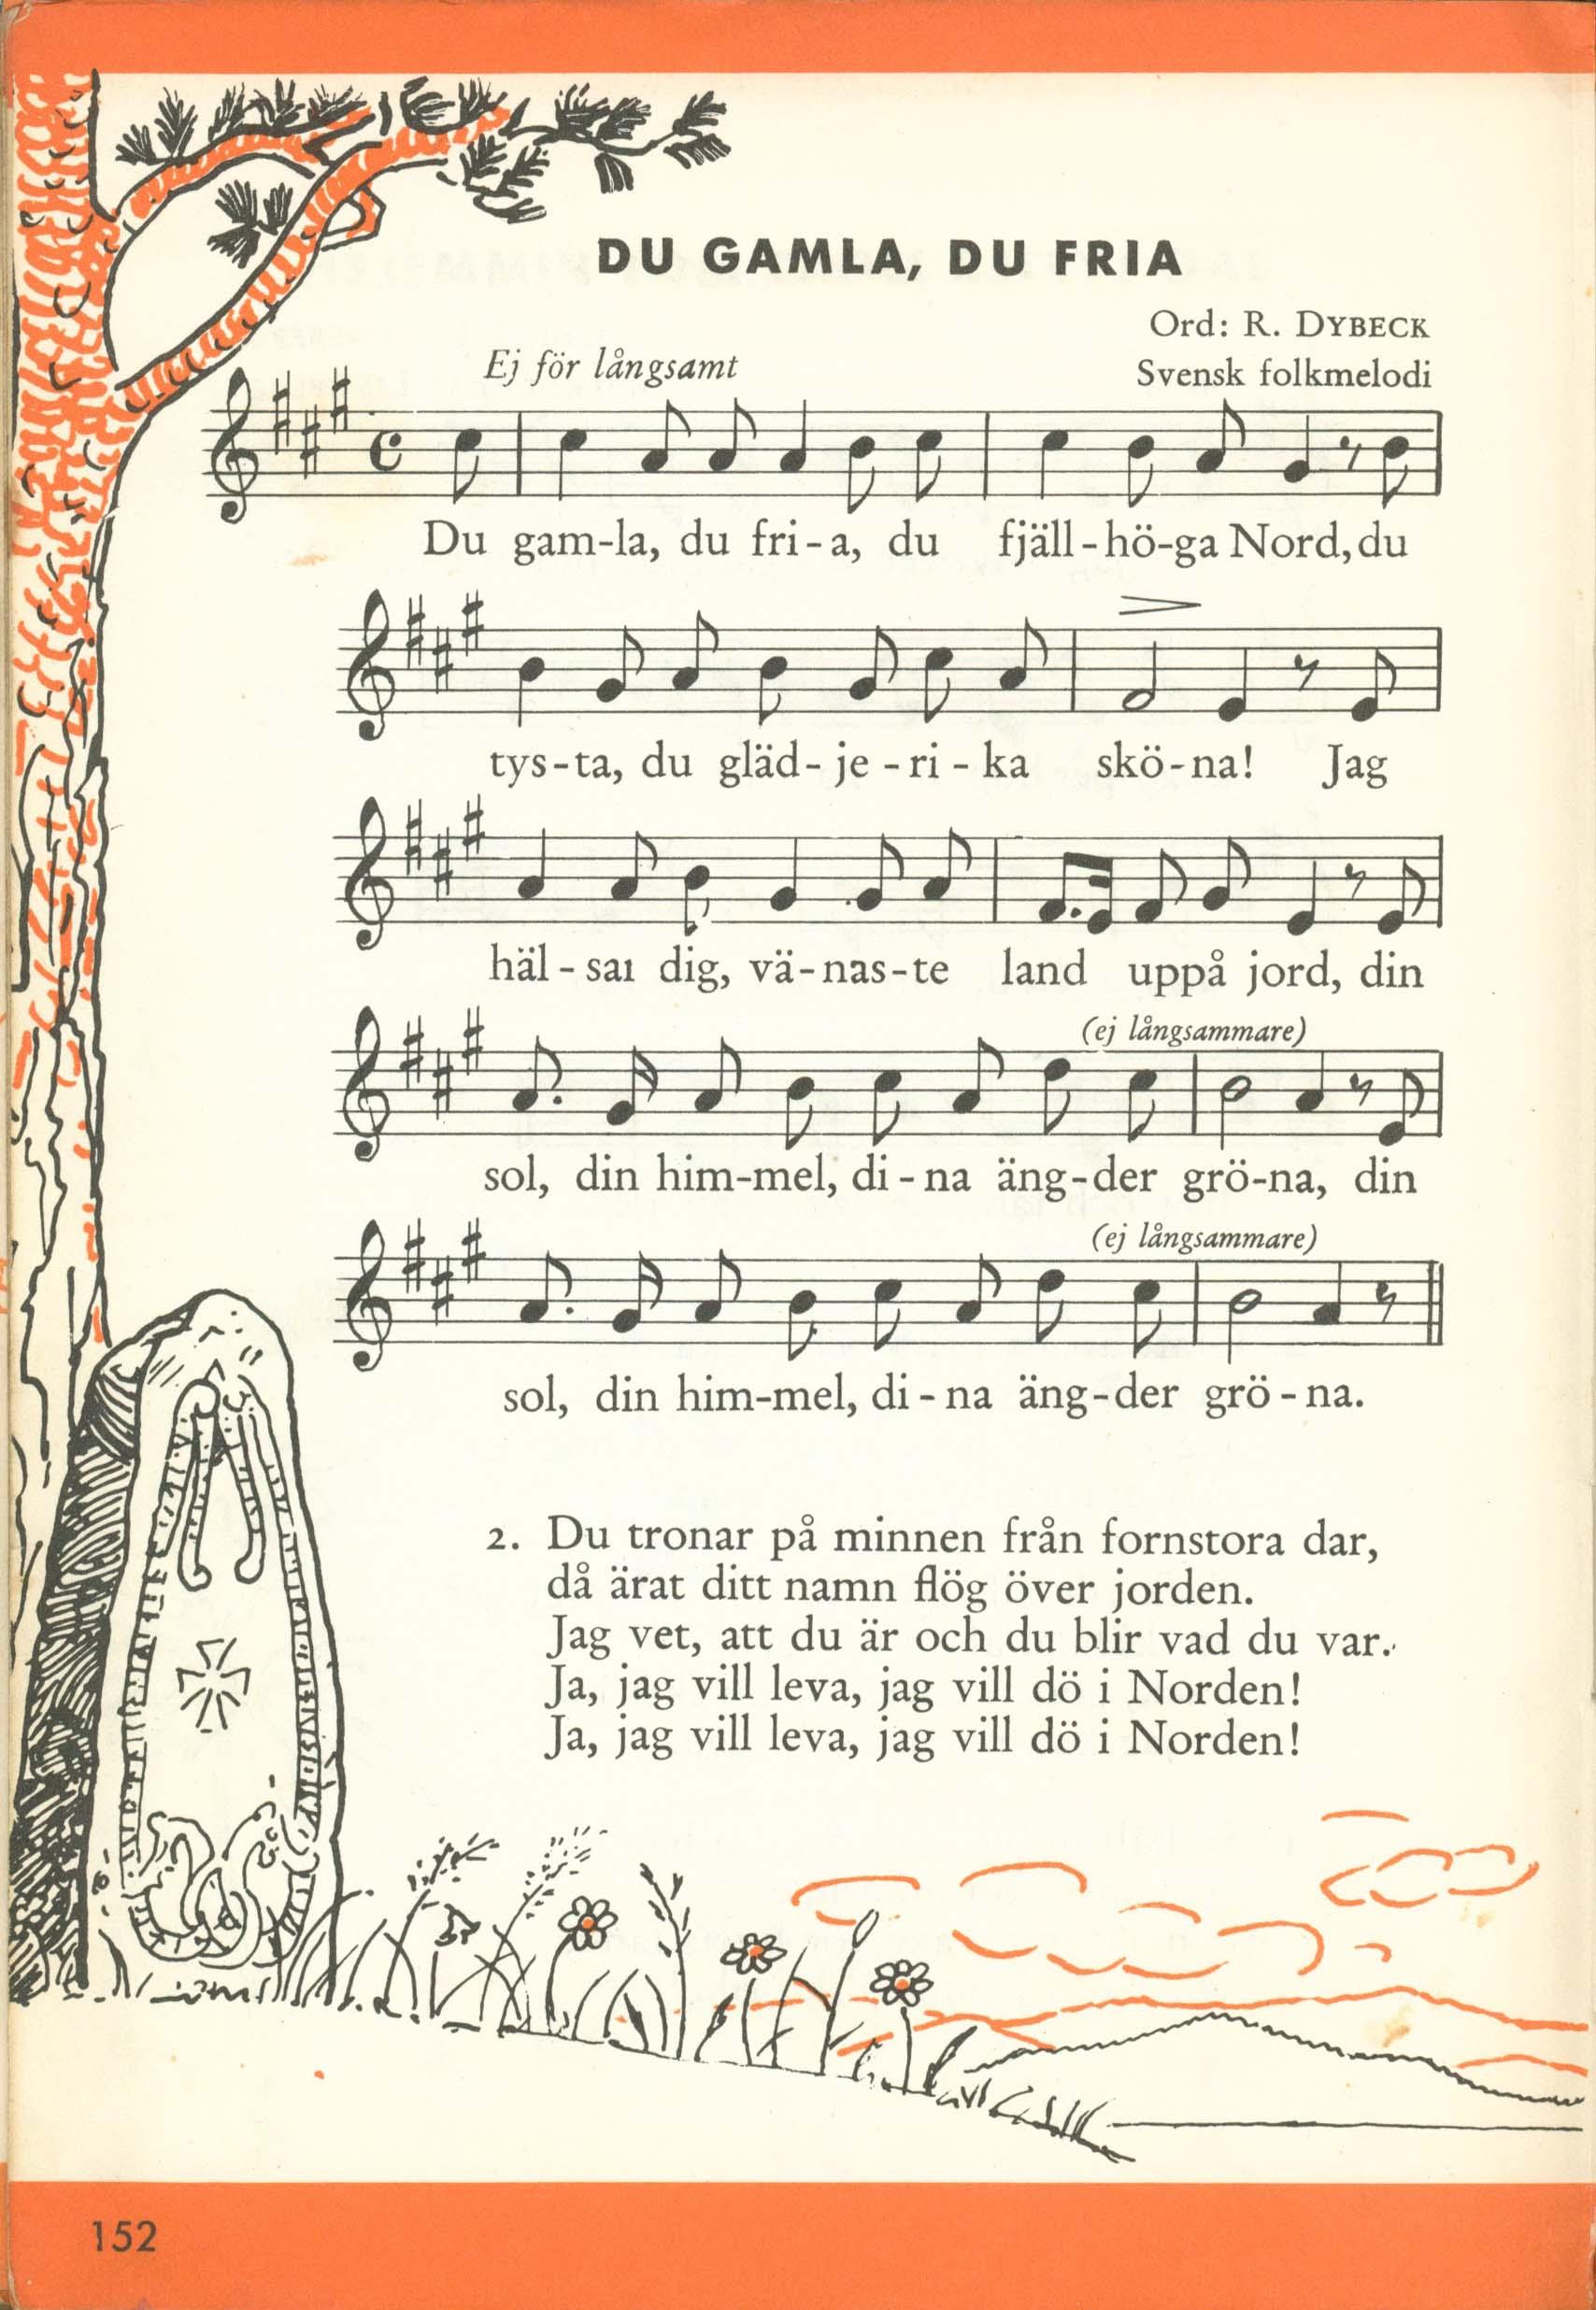 Dal Libro Nu ska vi sjunga - Du Gamla, du fria